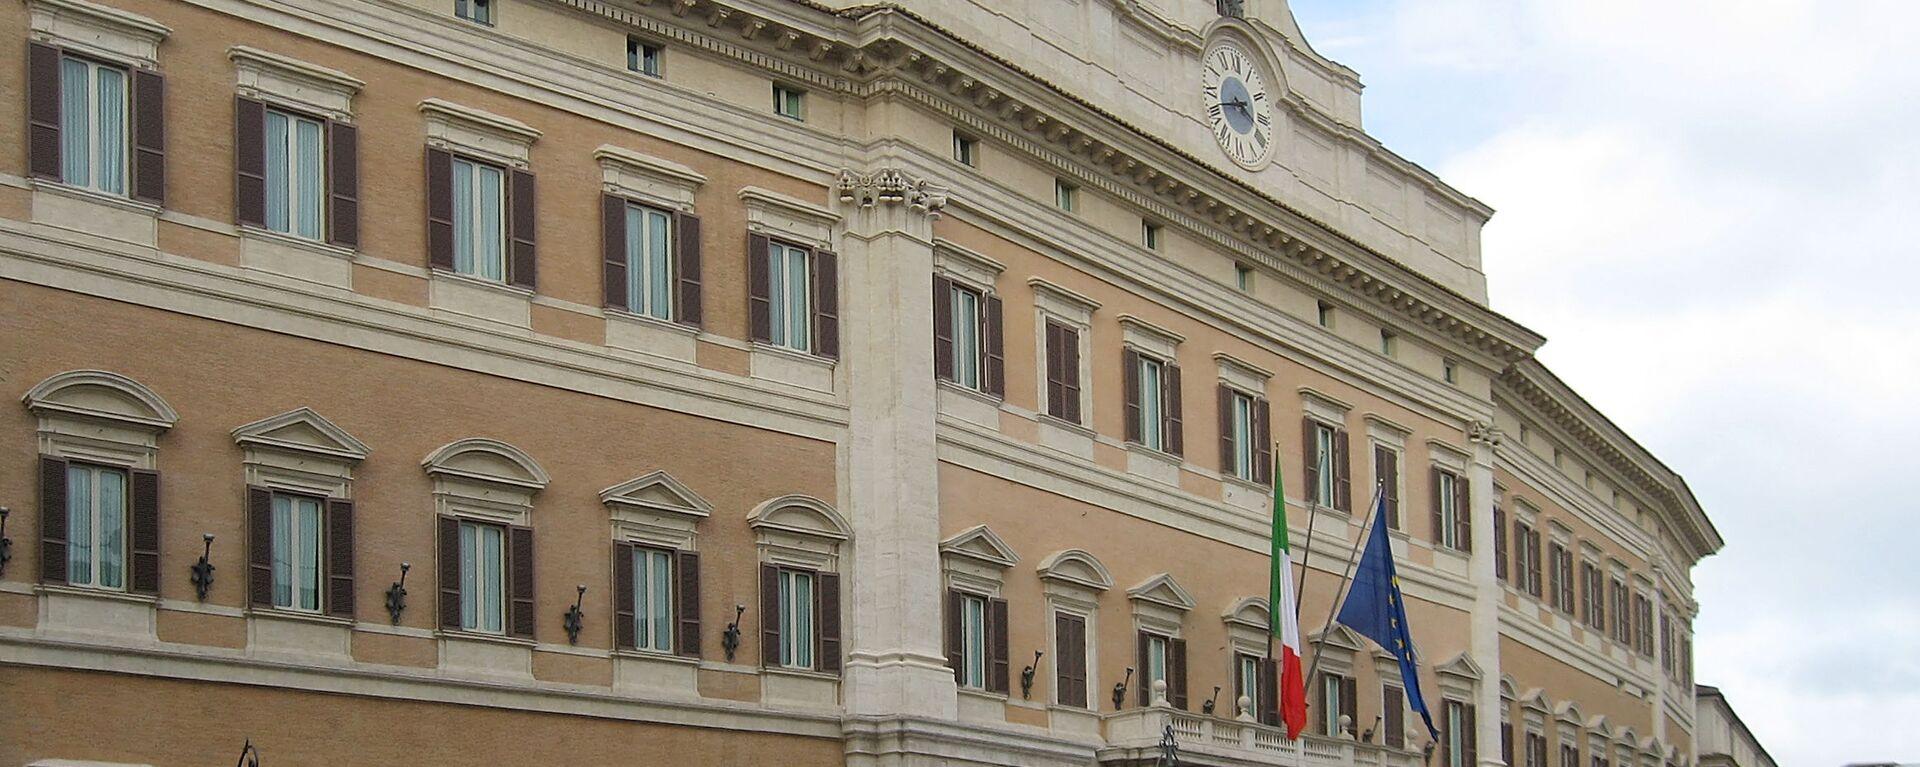 Parlamento italiano - Sputnik Italia, 1920, 04.02.2021